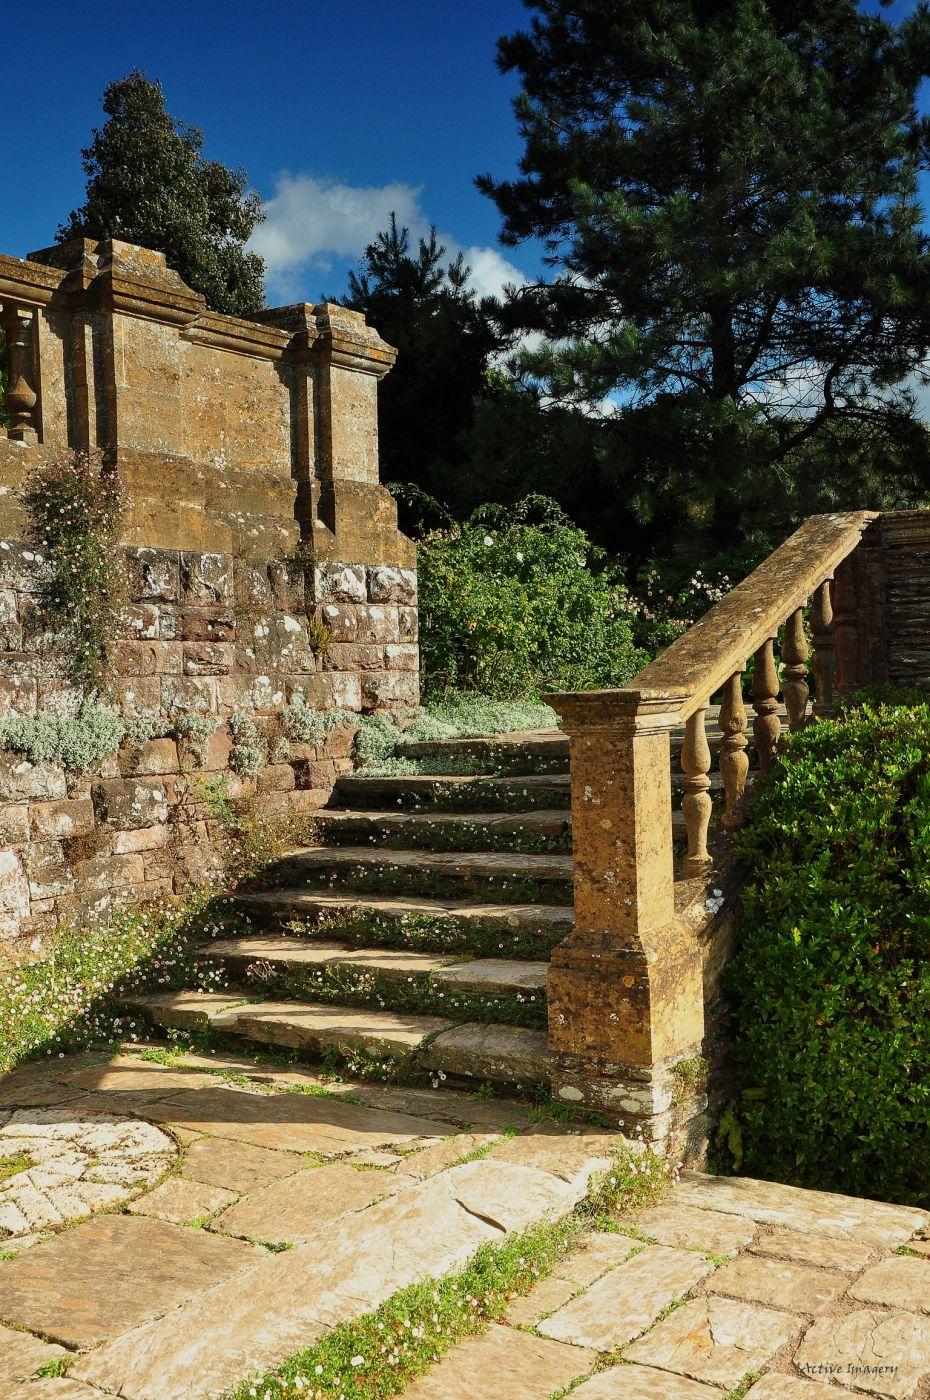 Hestercombe House and Gardens, United Kingdom